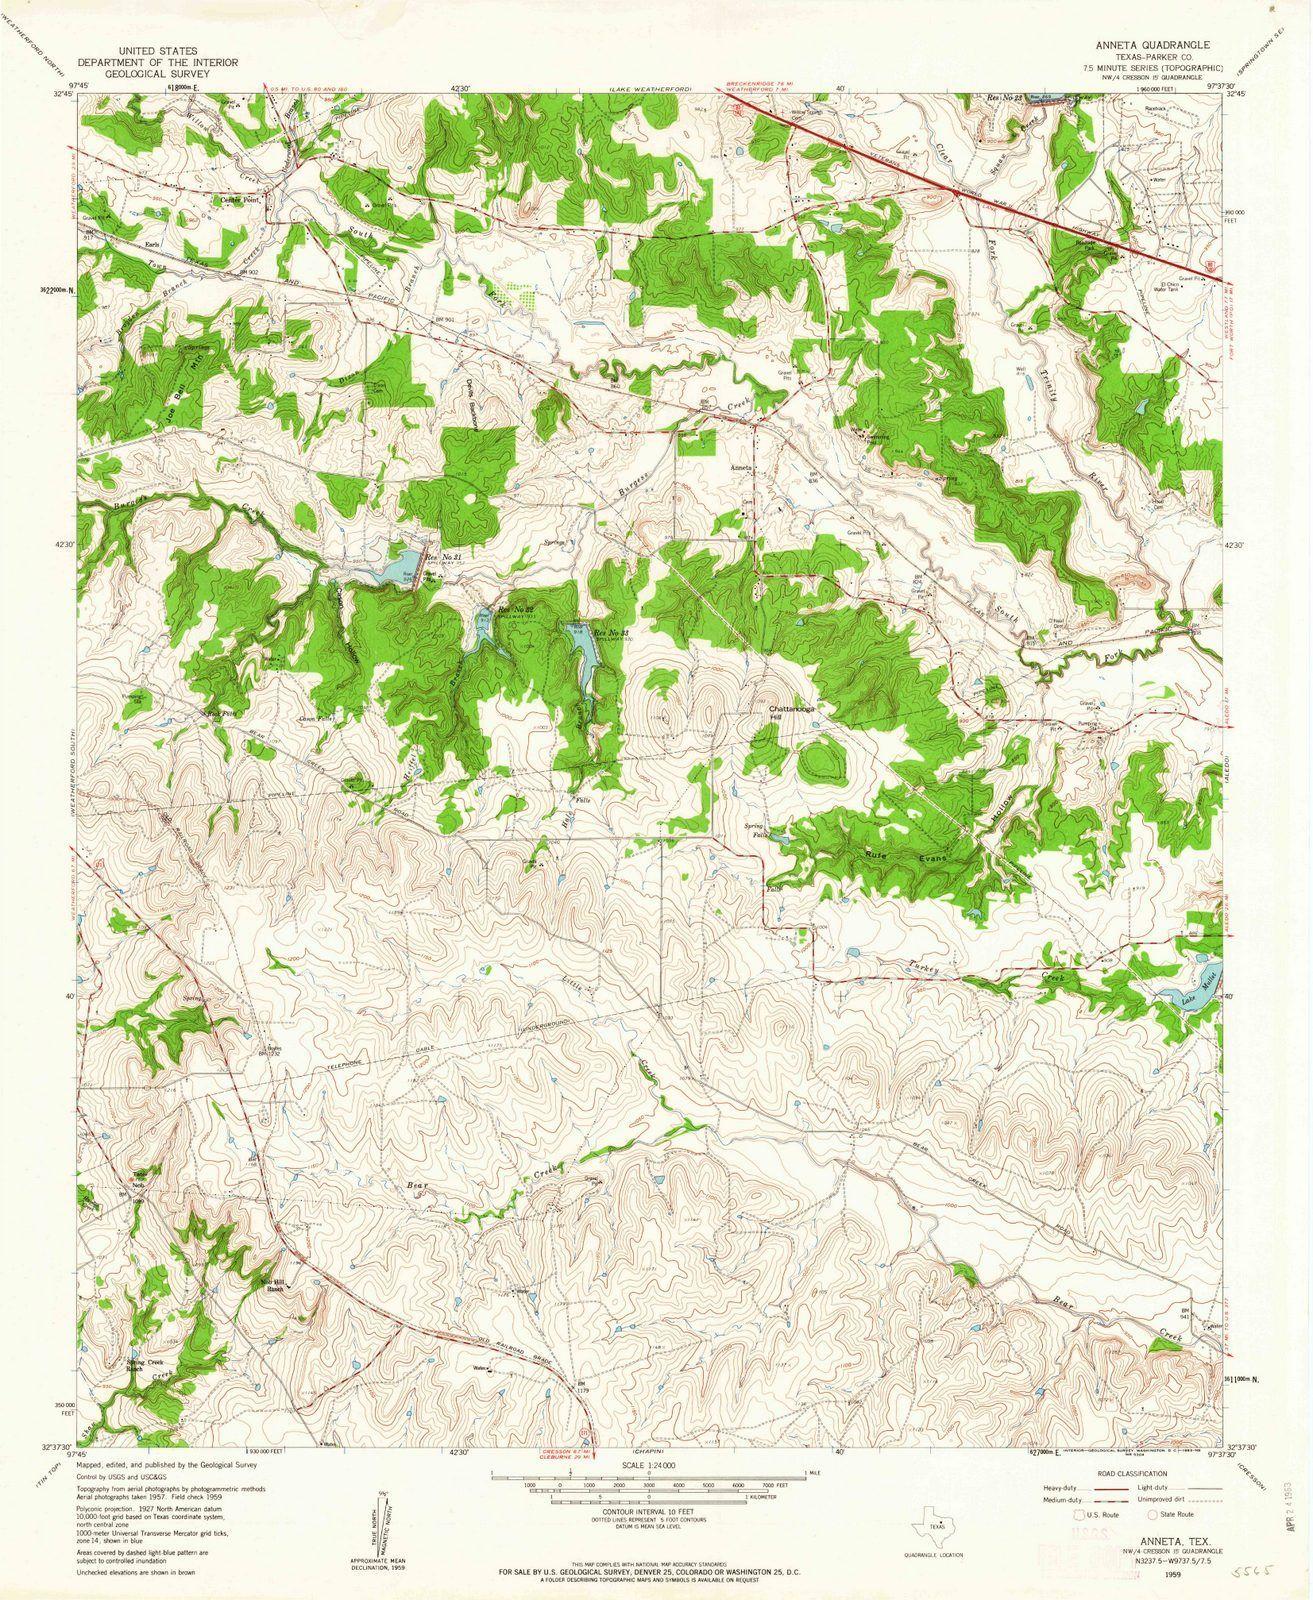 <p>1959 Anneta, TX - Texas - USGS Topographic Map</p>